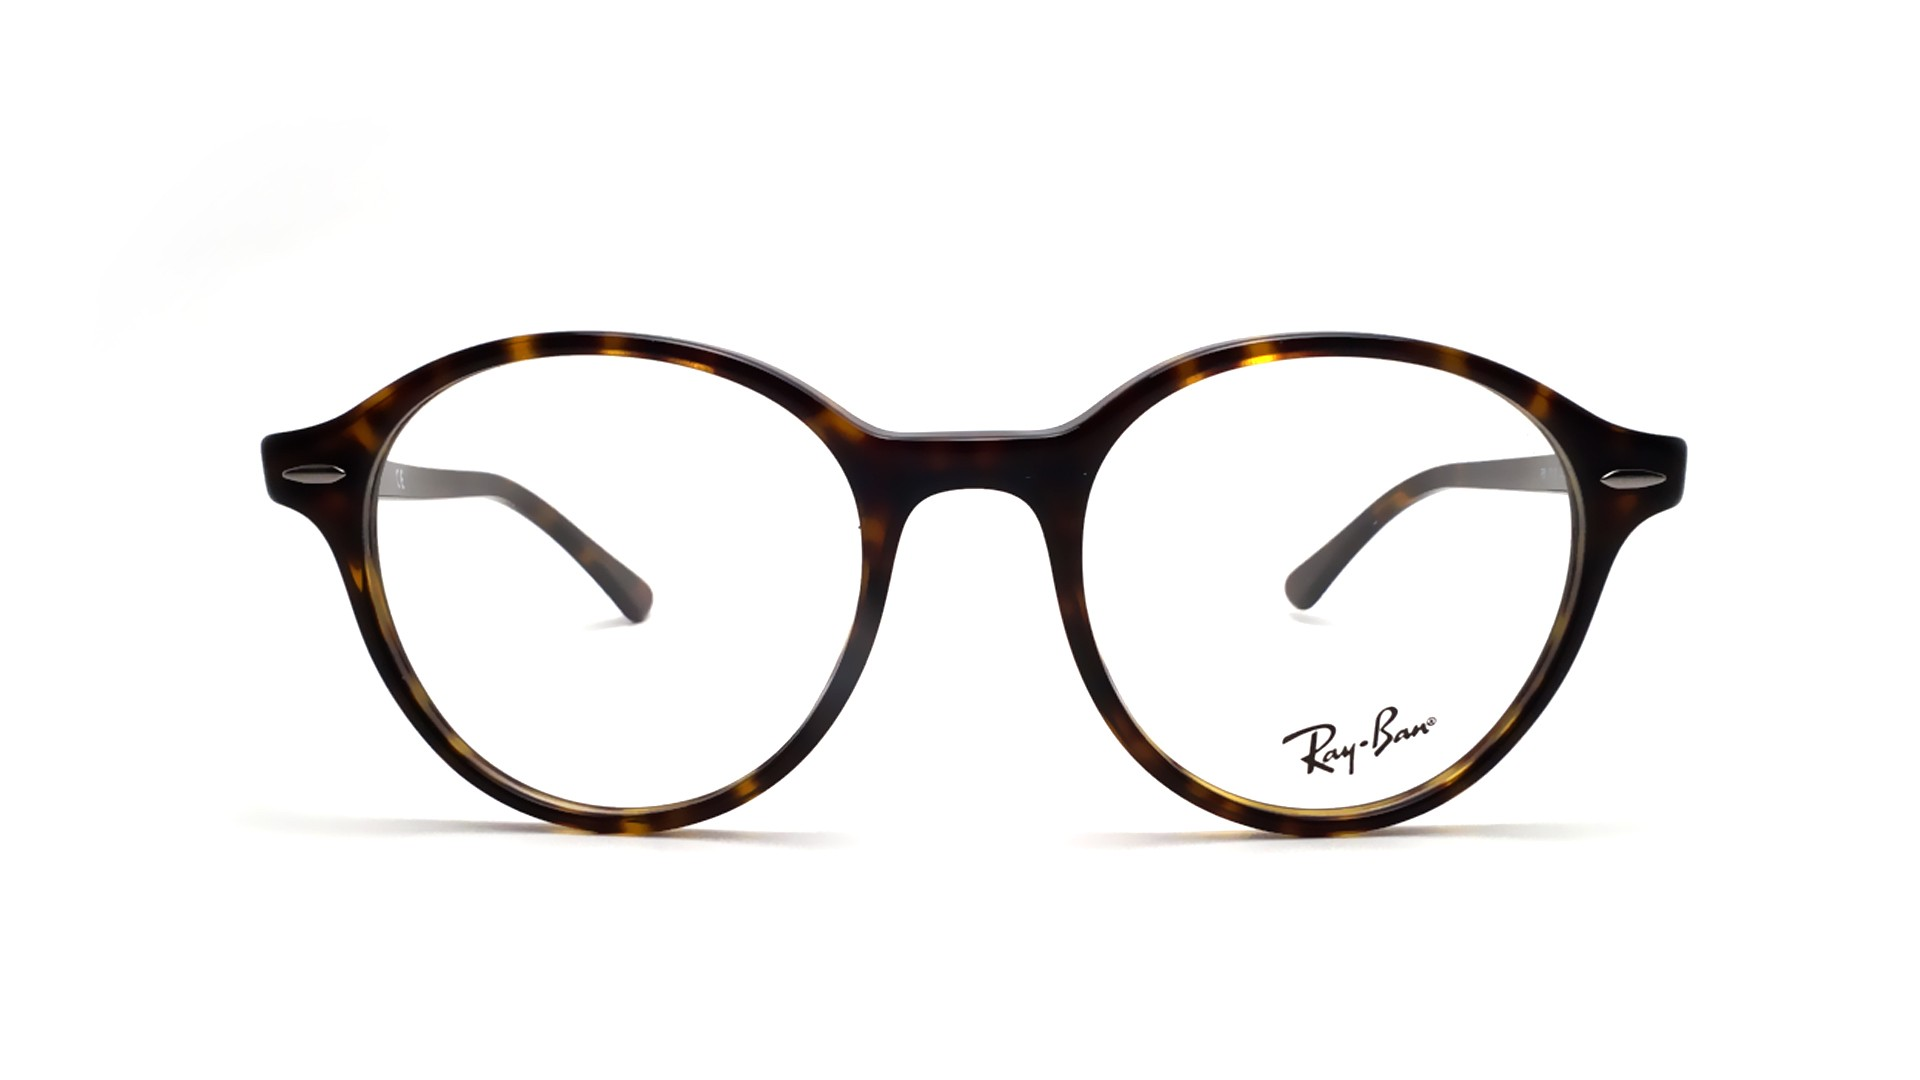 Ray-Ban Dean Tortoise RX7118 RB7118 2012 50-19 Visiofactory